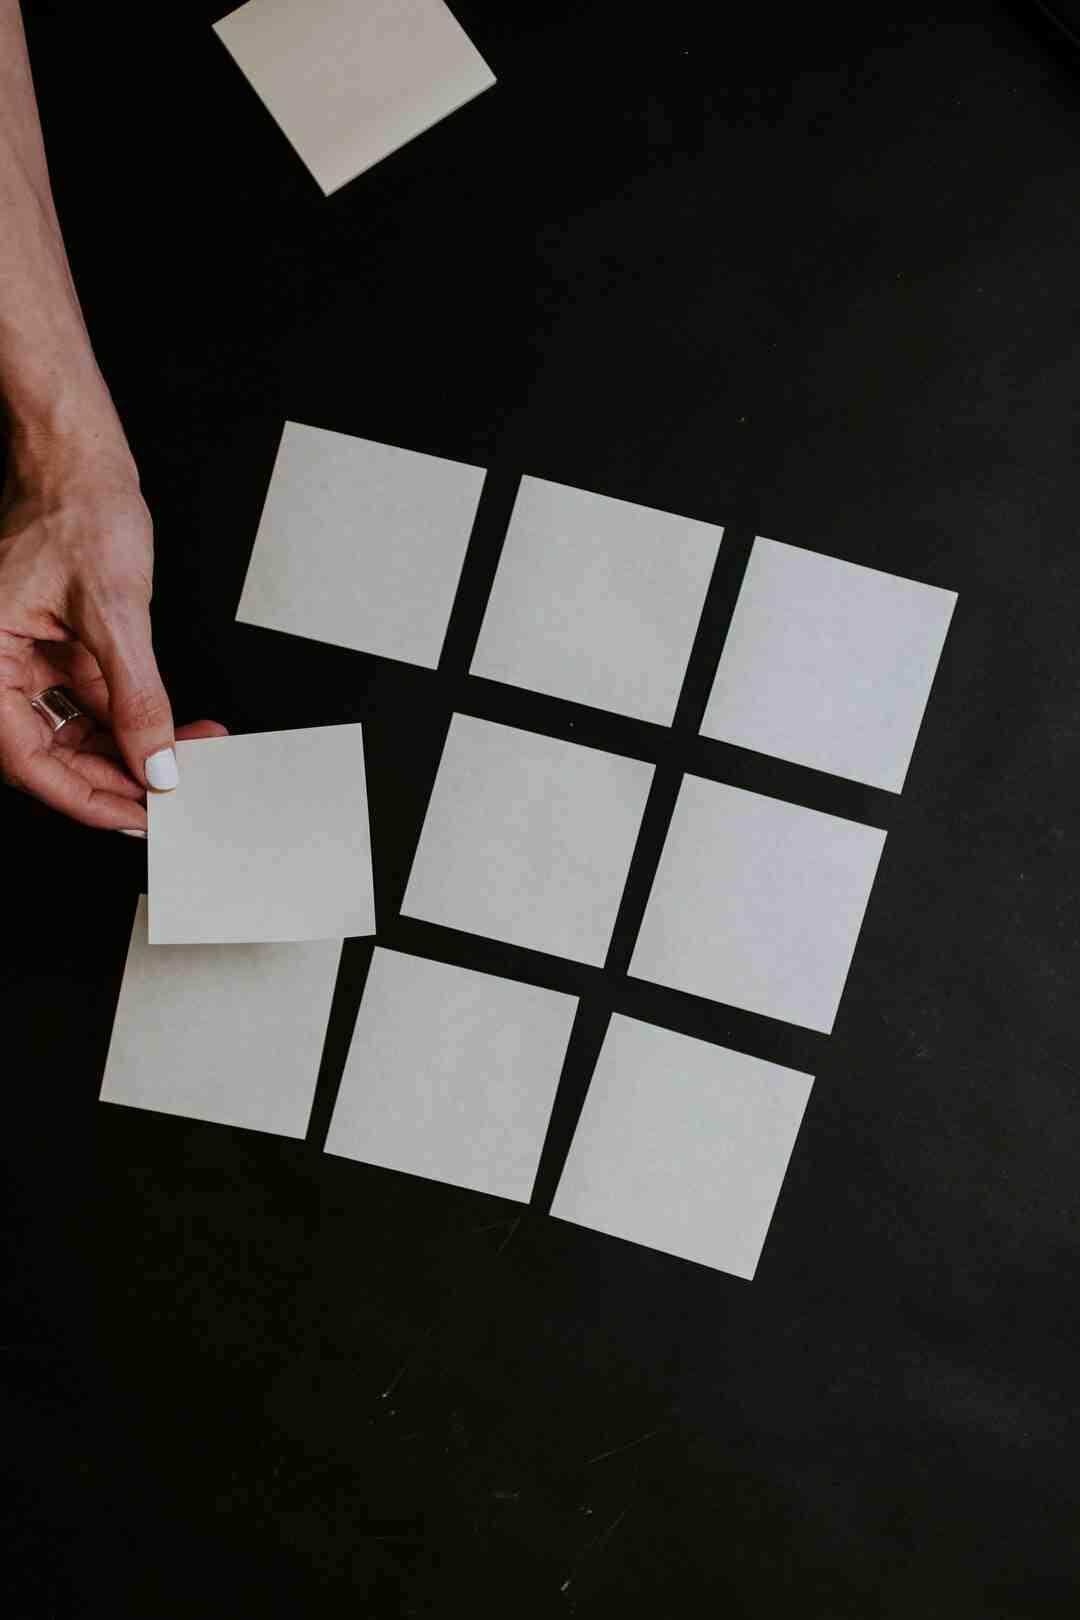 Jeux de cartes rami